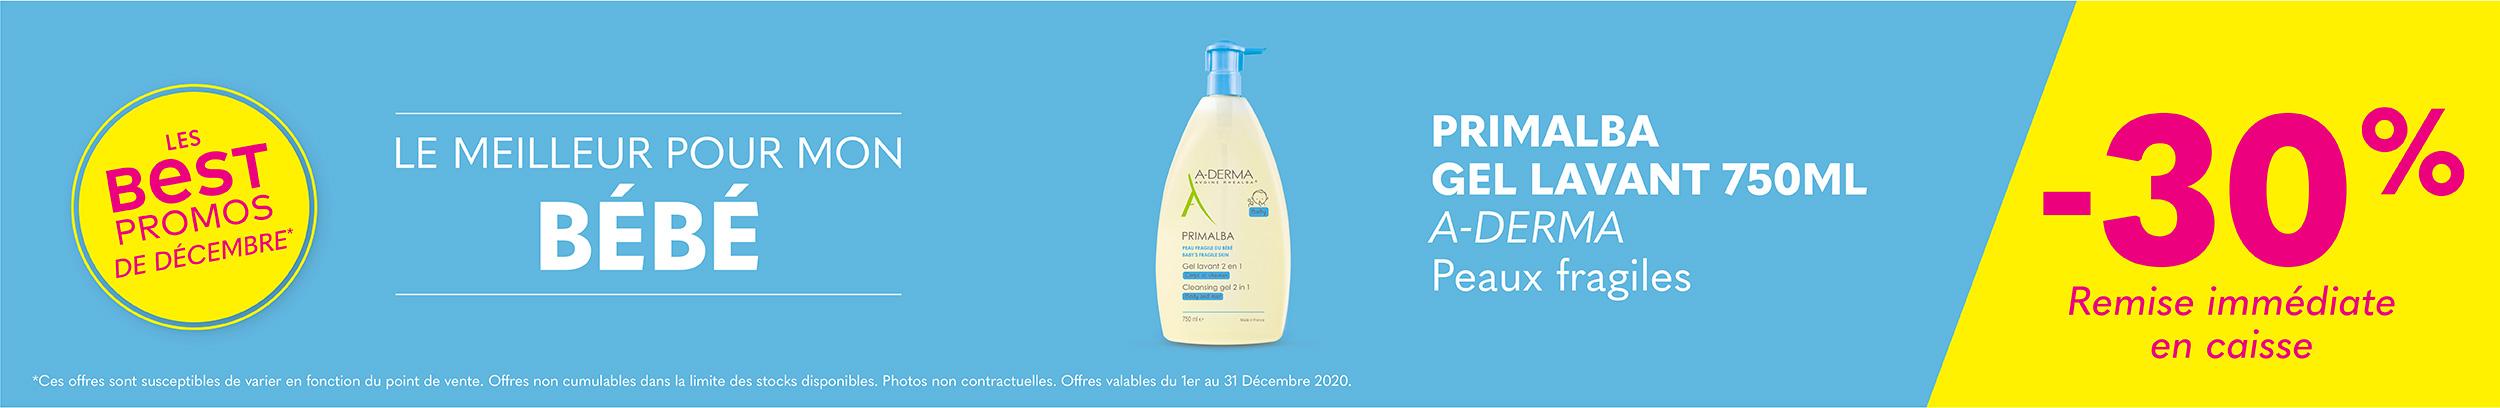 PRIMALBA GEL LAVANT 750ML - A-DERMA / Peaux fragiles